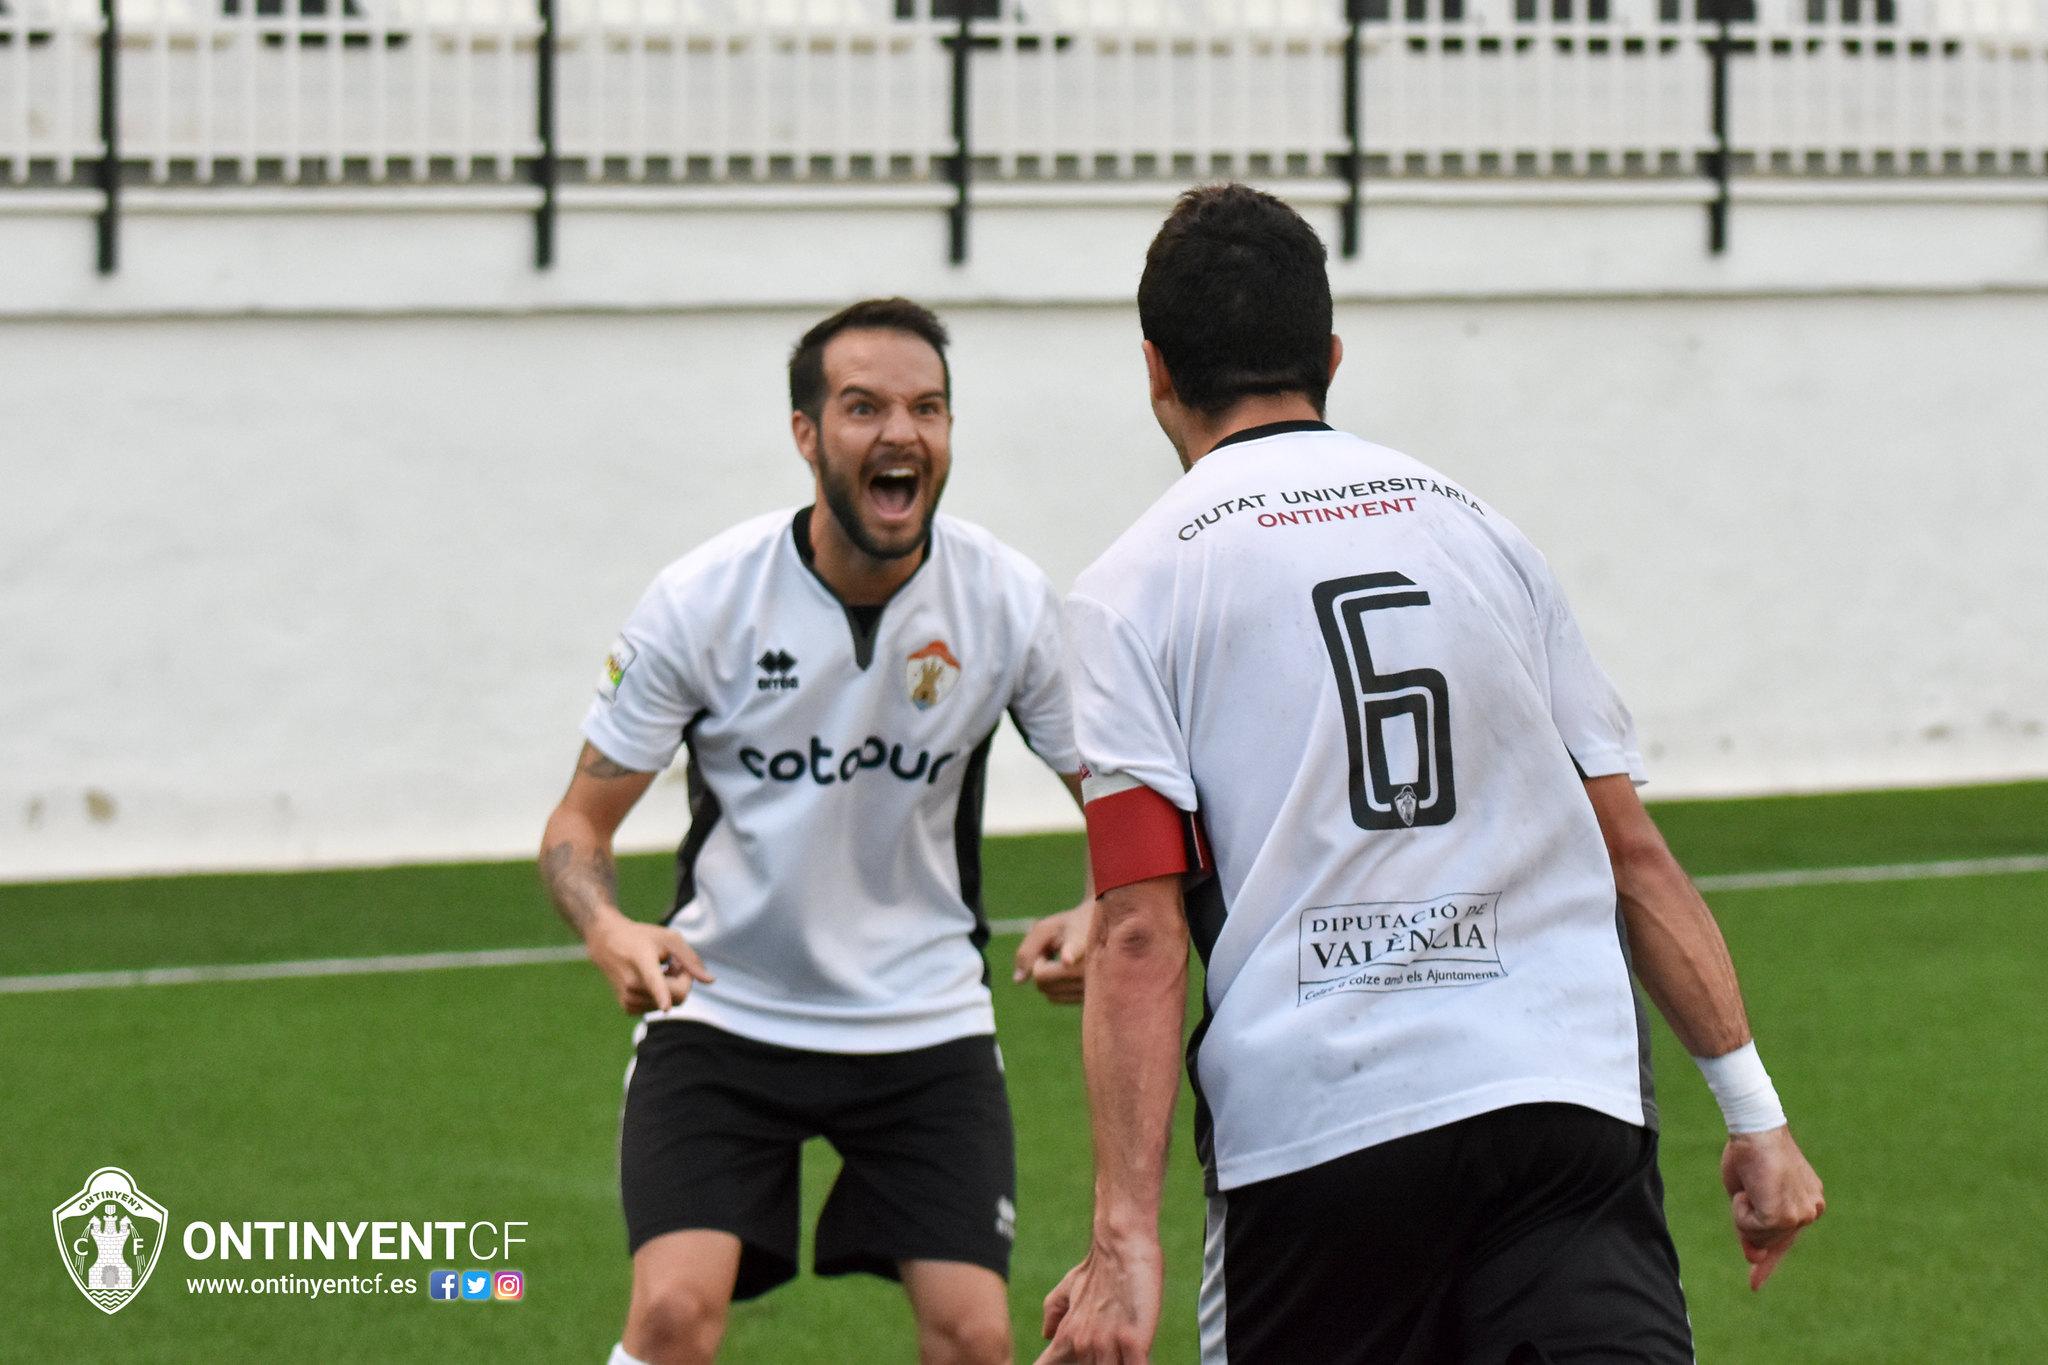 J11 Ontinyent CF (1) - (0) CF Badalona